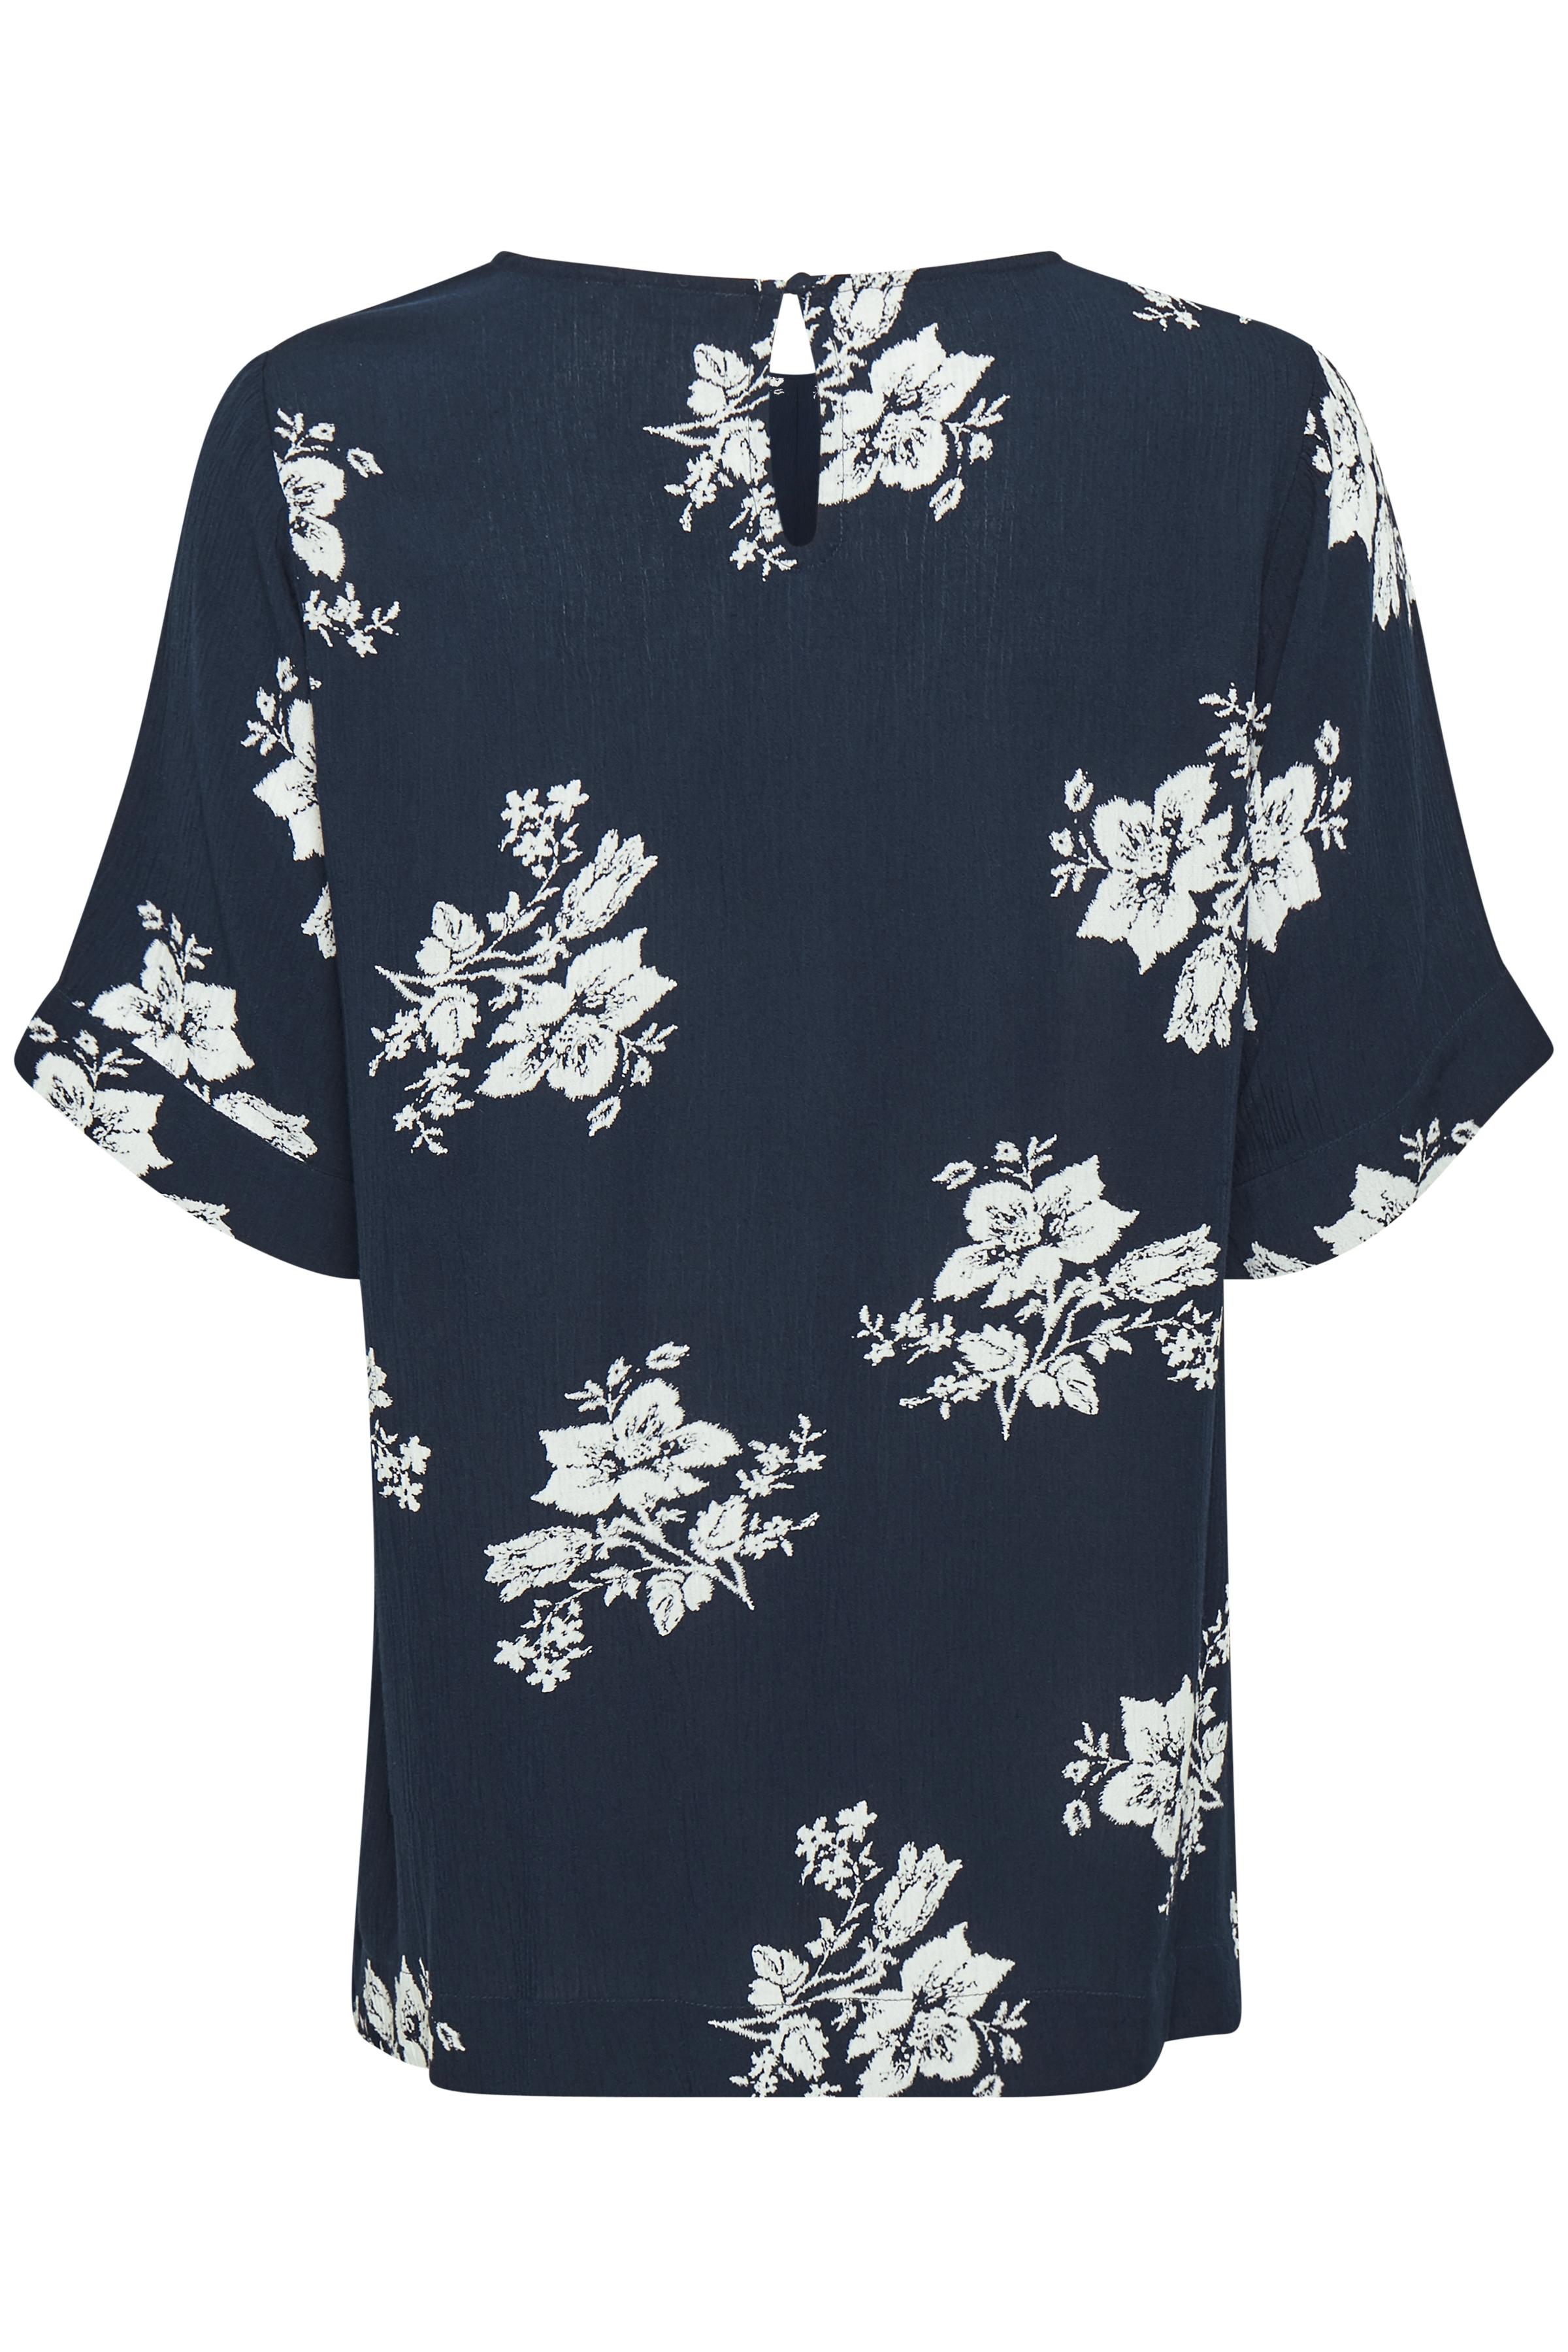 Marineblå/off-white Bluse  fra Bon'A Parte – Køb Marineblå/off-white Bluse  fra str. S-2XL her